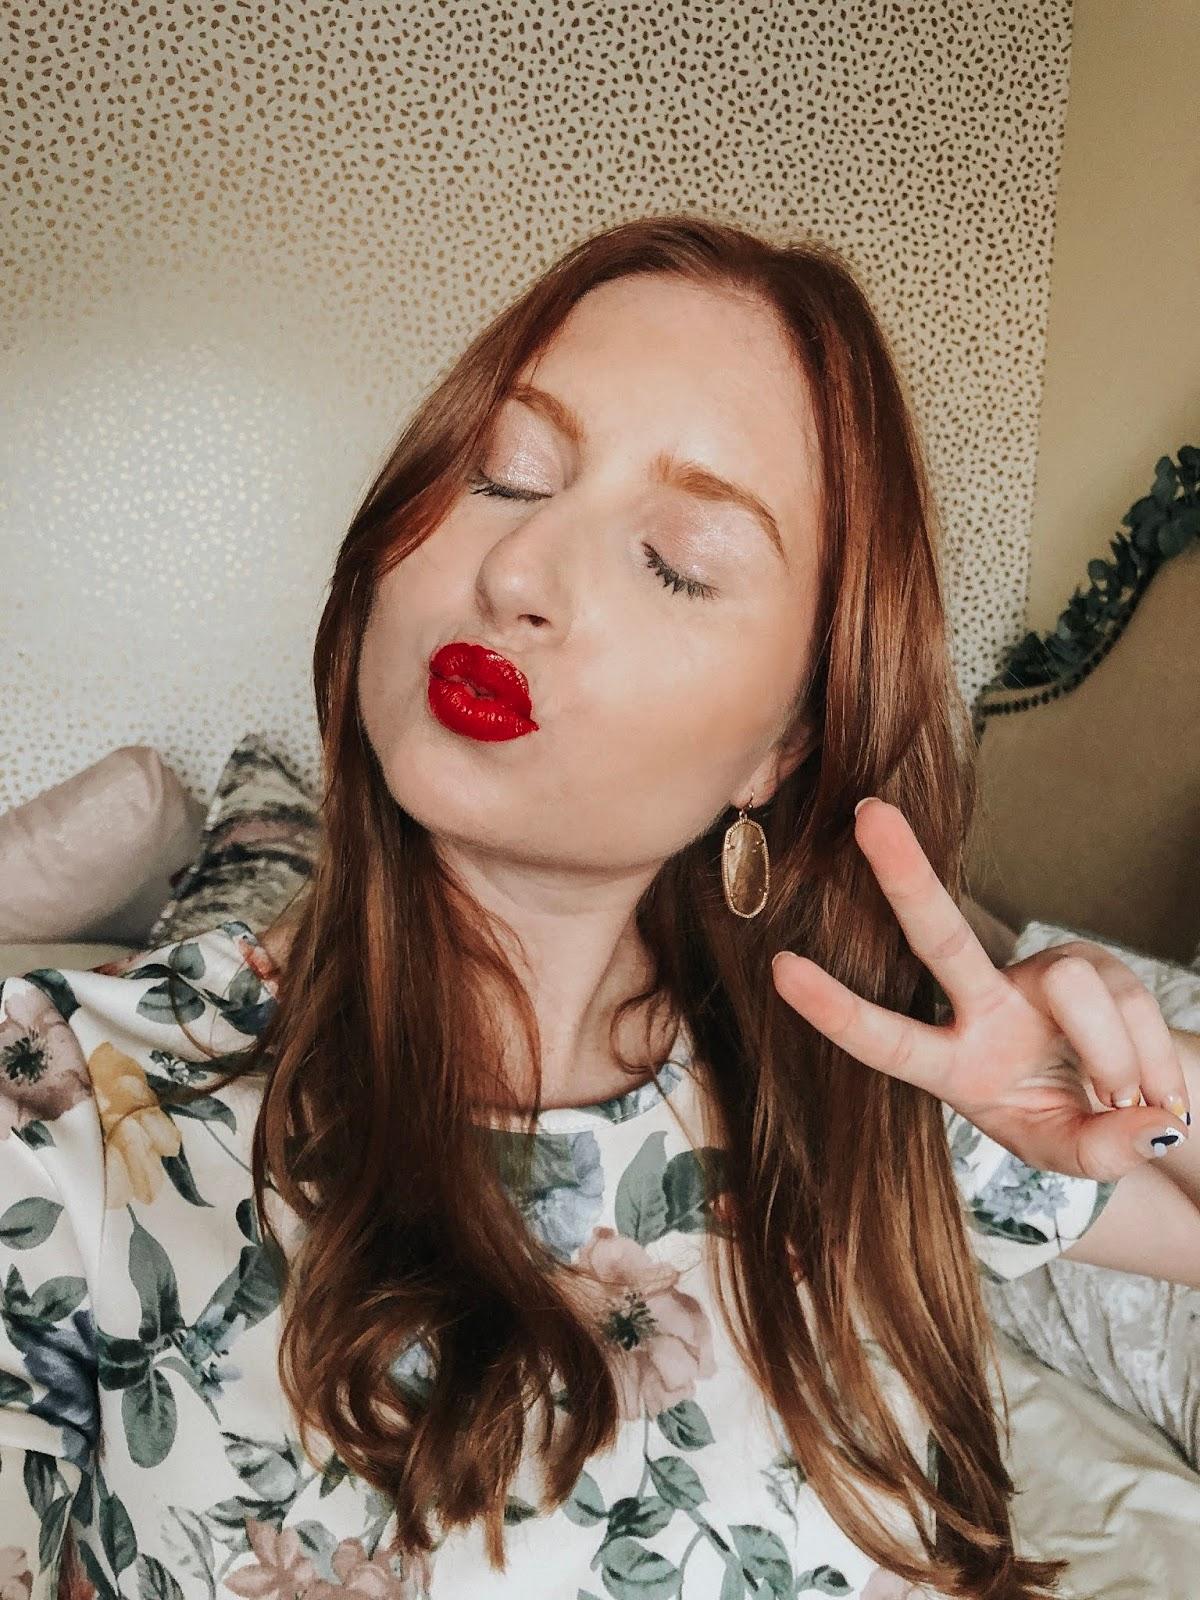 Best Drugstore Lipsticks for Fair Skin: Summer Edition Maybelline SuperStay Matte Ink Lipstick in Pioneer from ULTA Beauty Store